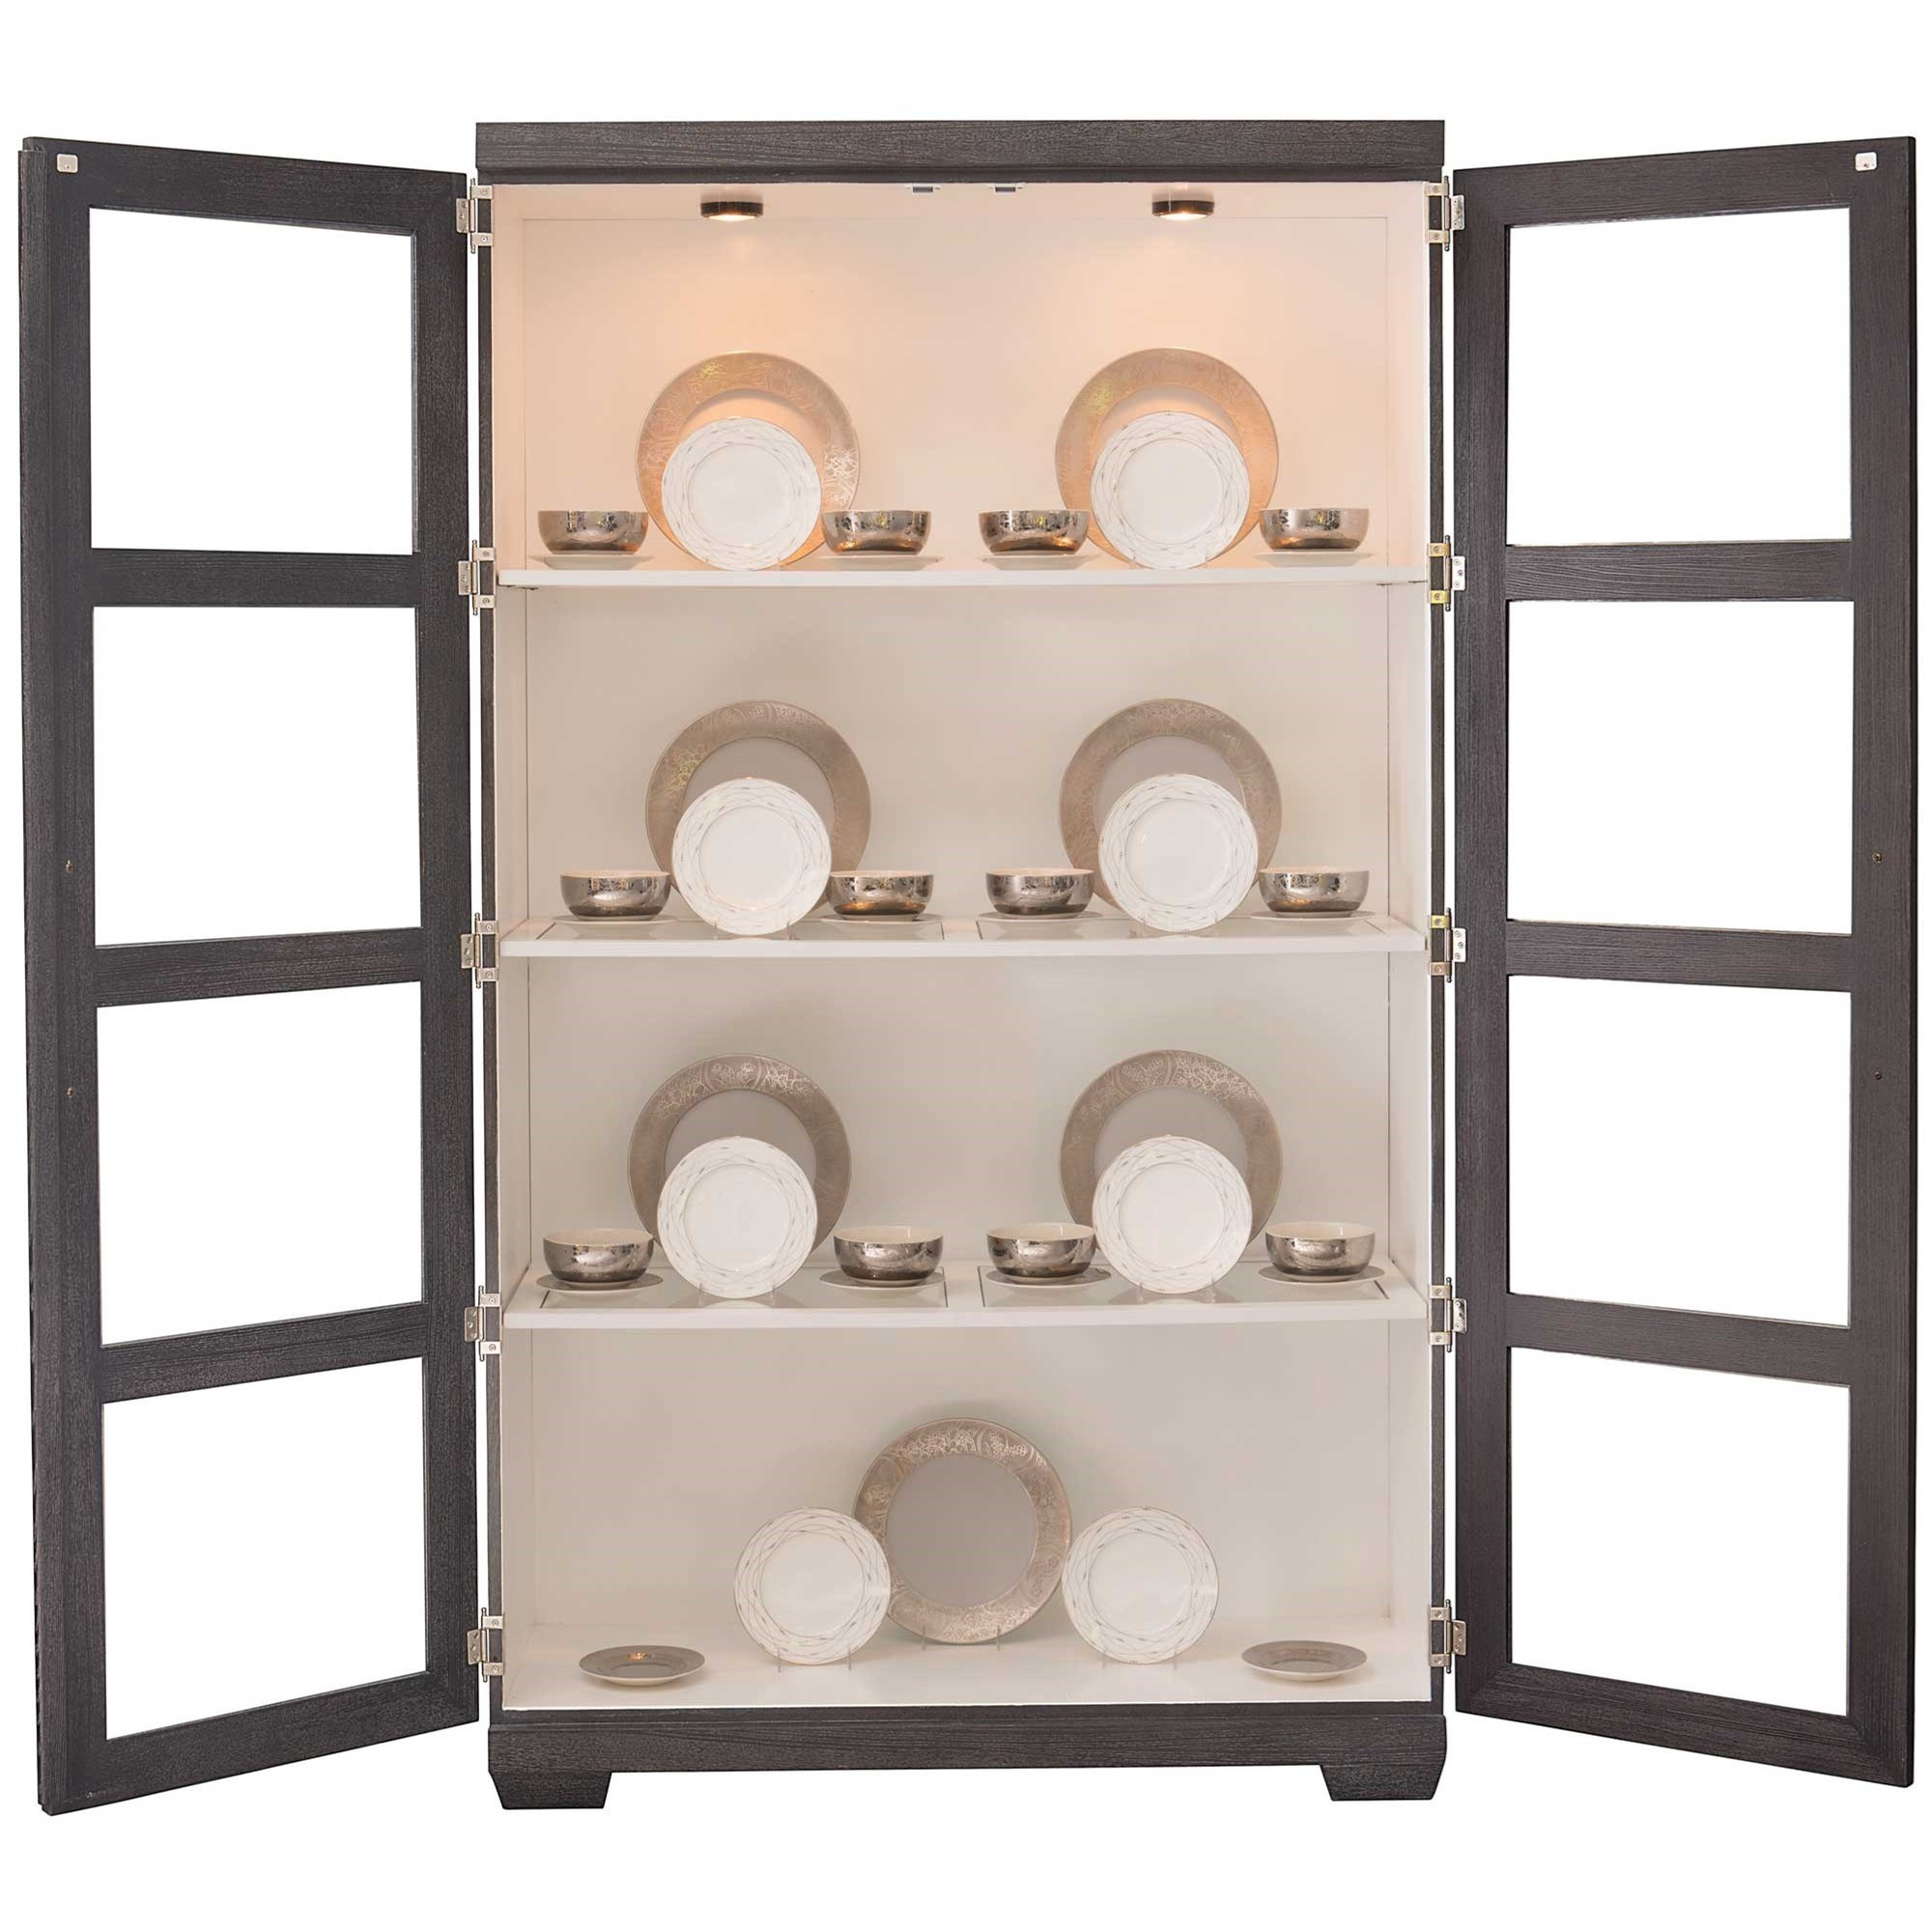 Bernhardt Decorage 380 356 Contemporary Display Cabinet